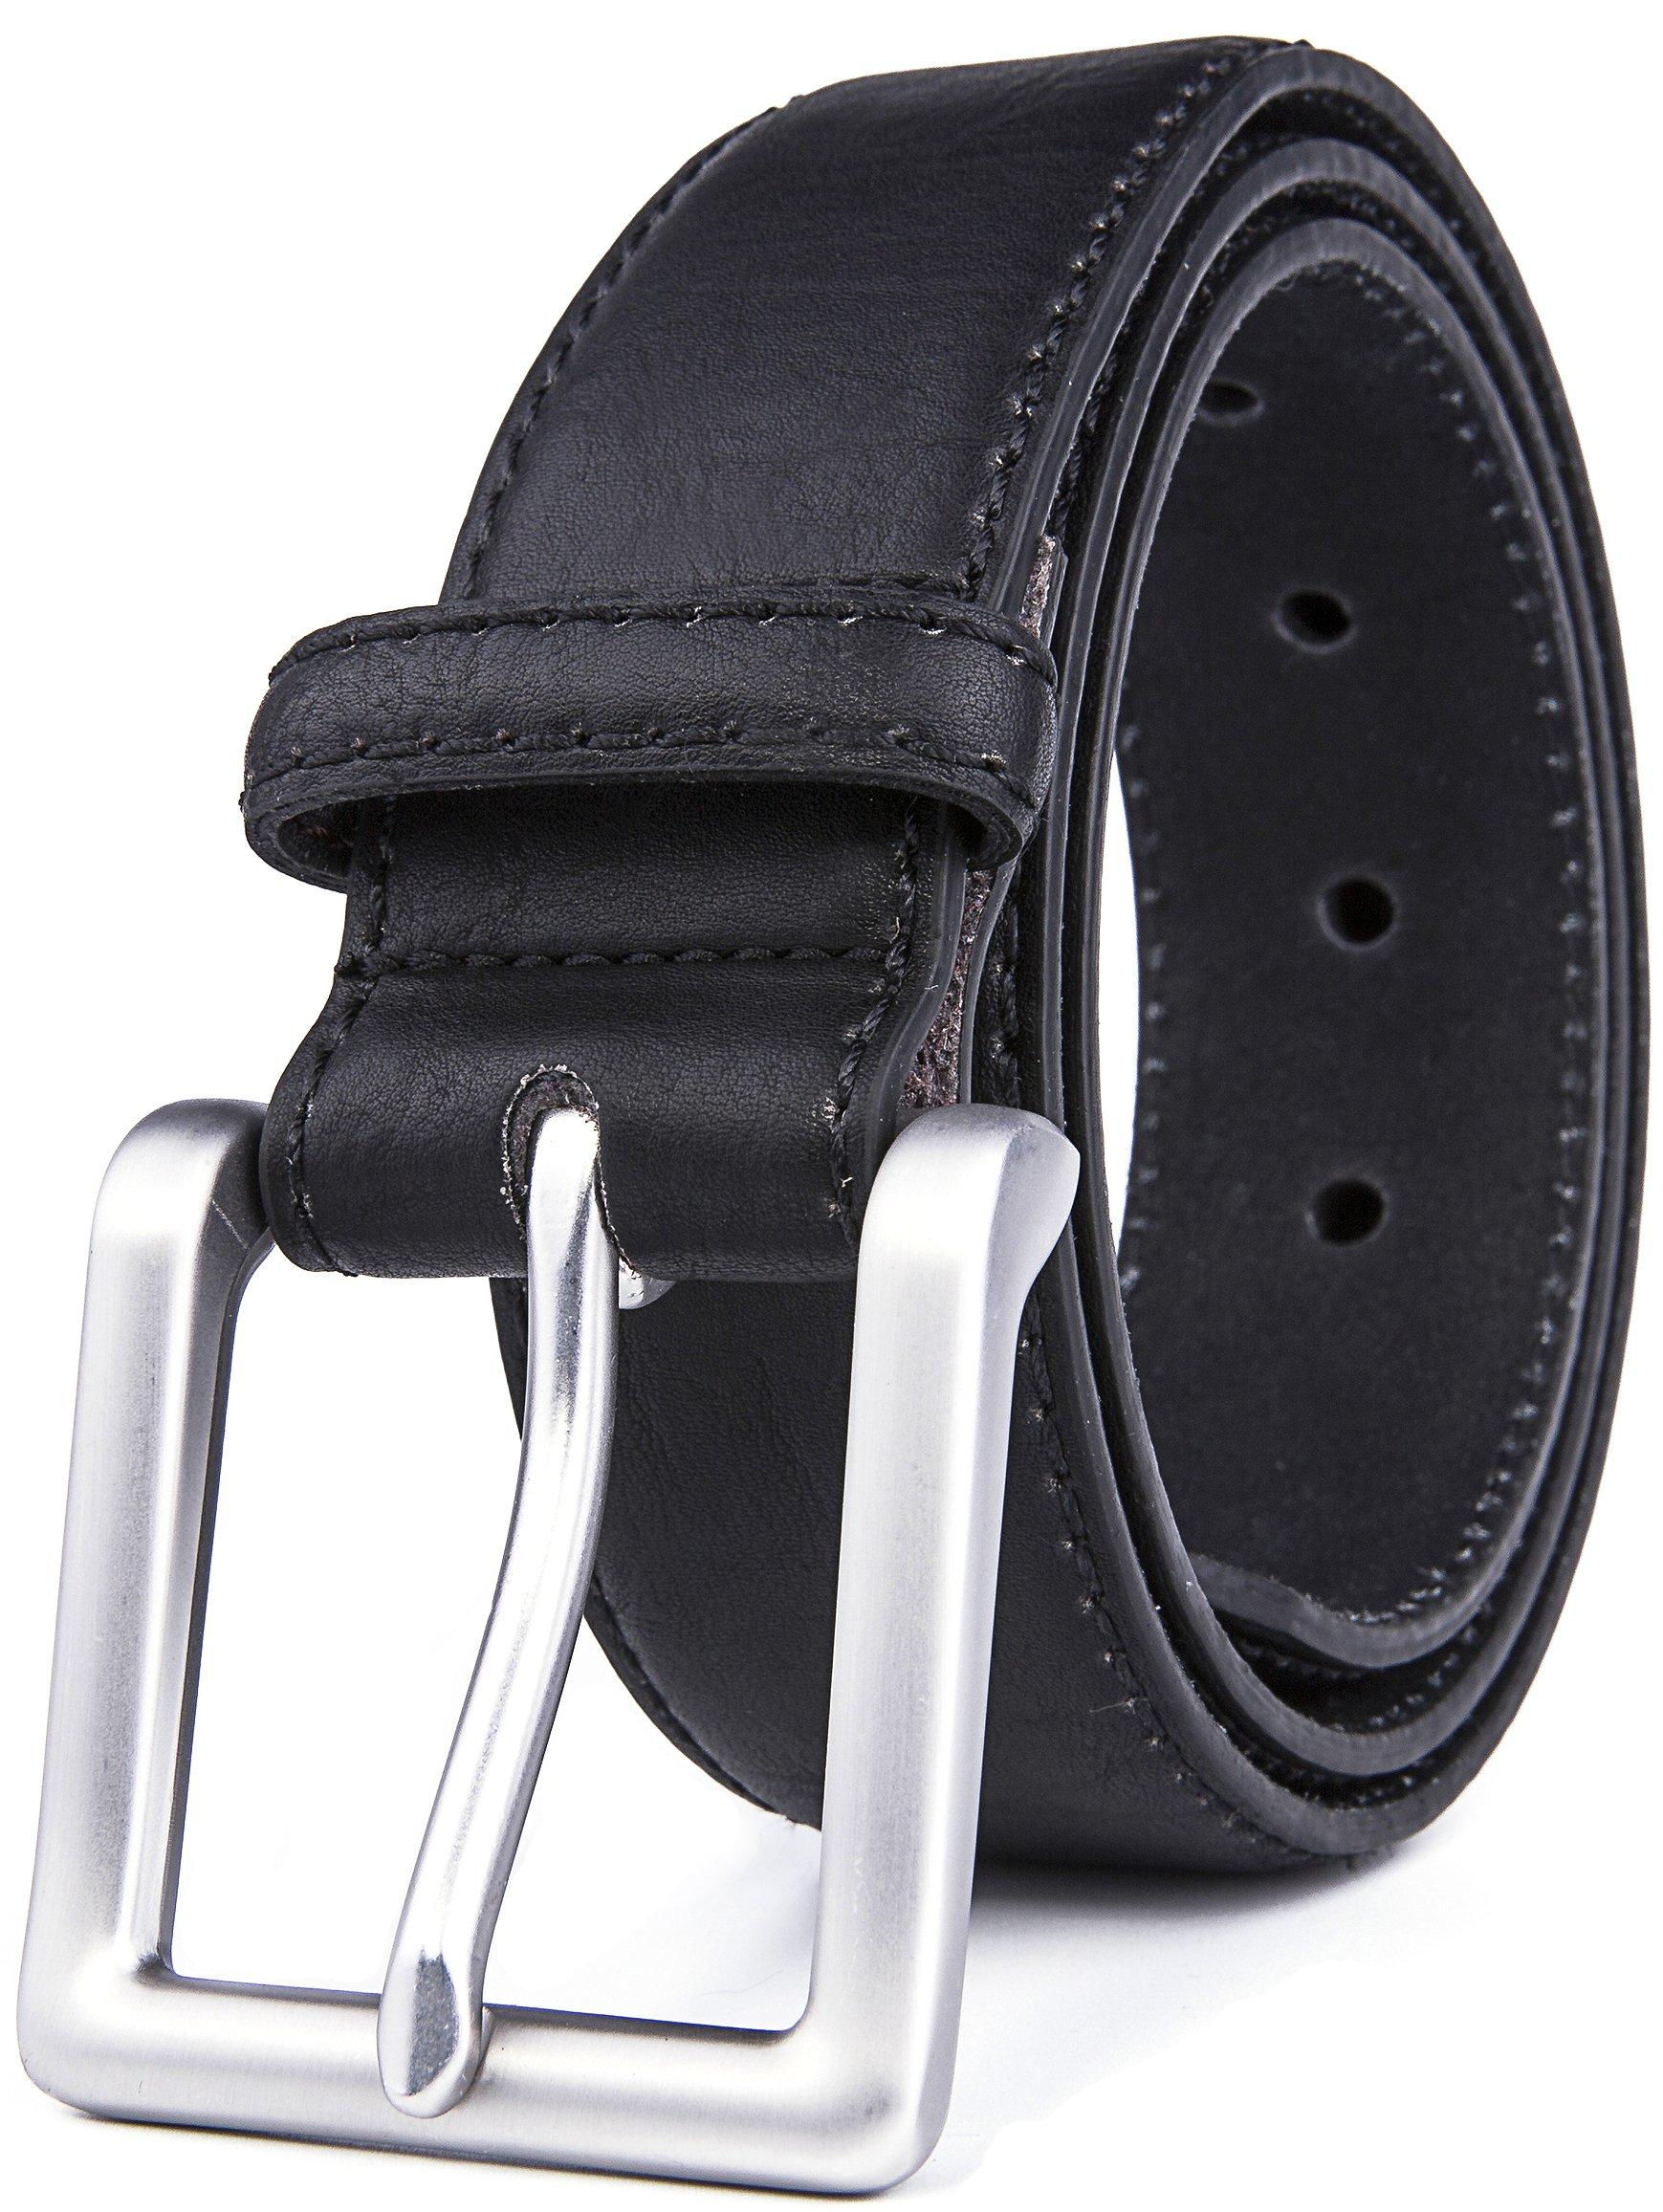 Belts for Men, Classic Stitched 1.69'' Width, Regular Tall & Big sizes - Mens Jeans Belt - Handmade (36/38, 2 Black)